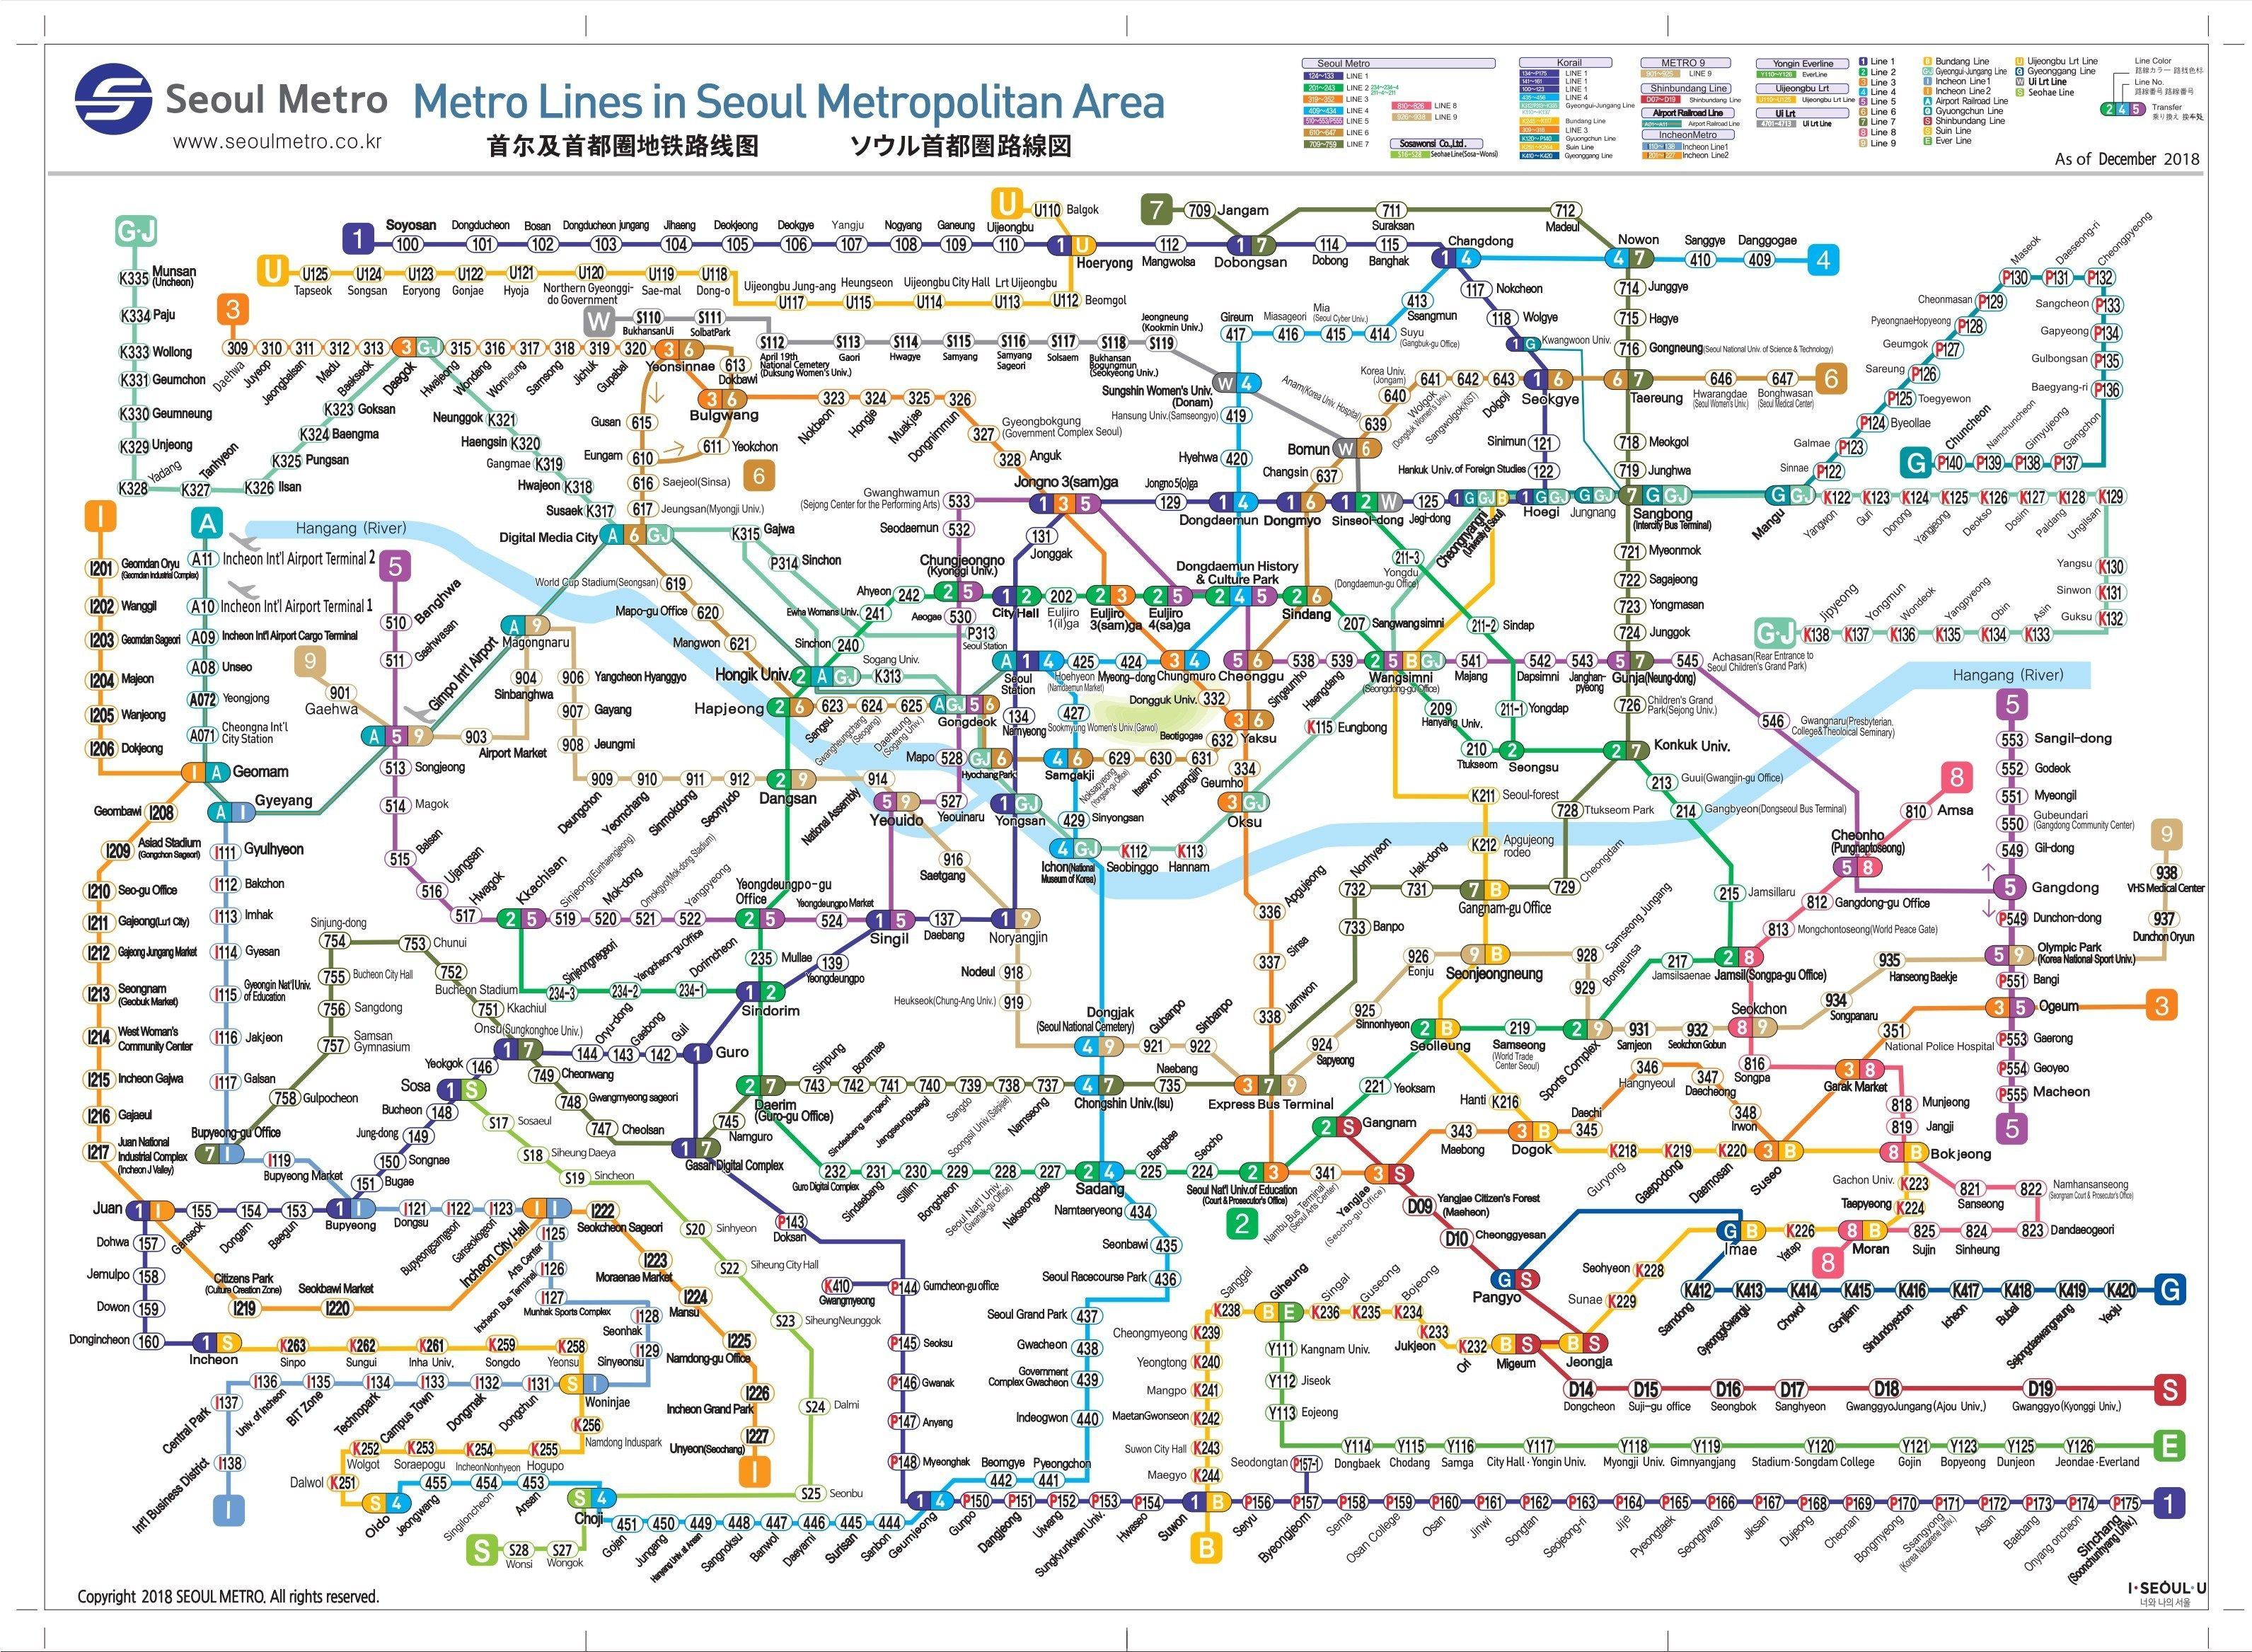 Korea Subway Map 2014.Seoul Metro Map Metro Map Subway Map Seoul Itinerary